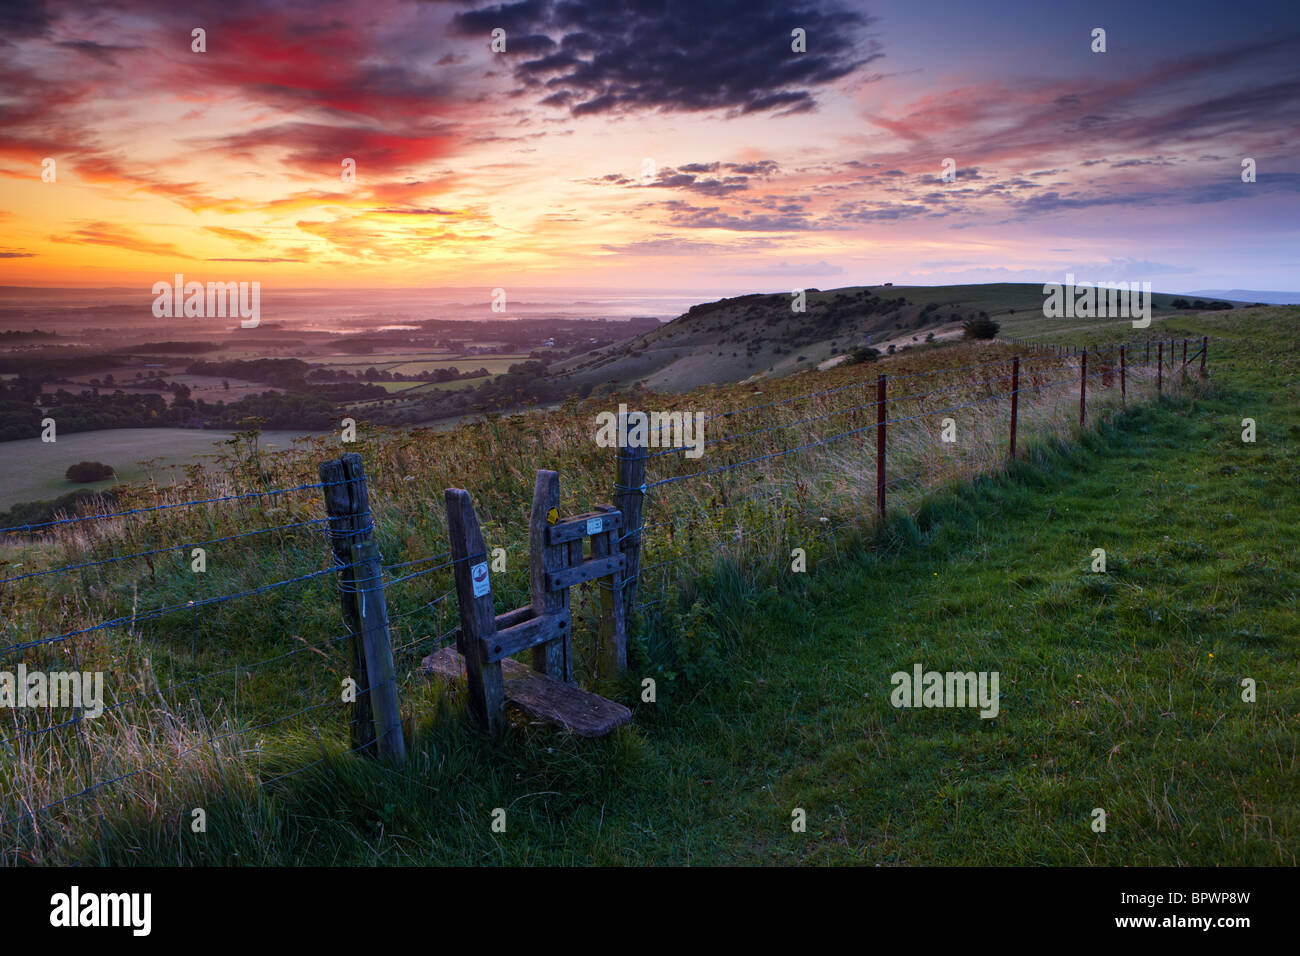 Views from Ditching Beacon along the South Downs Way at dawn - Stock Image